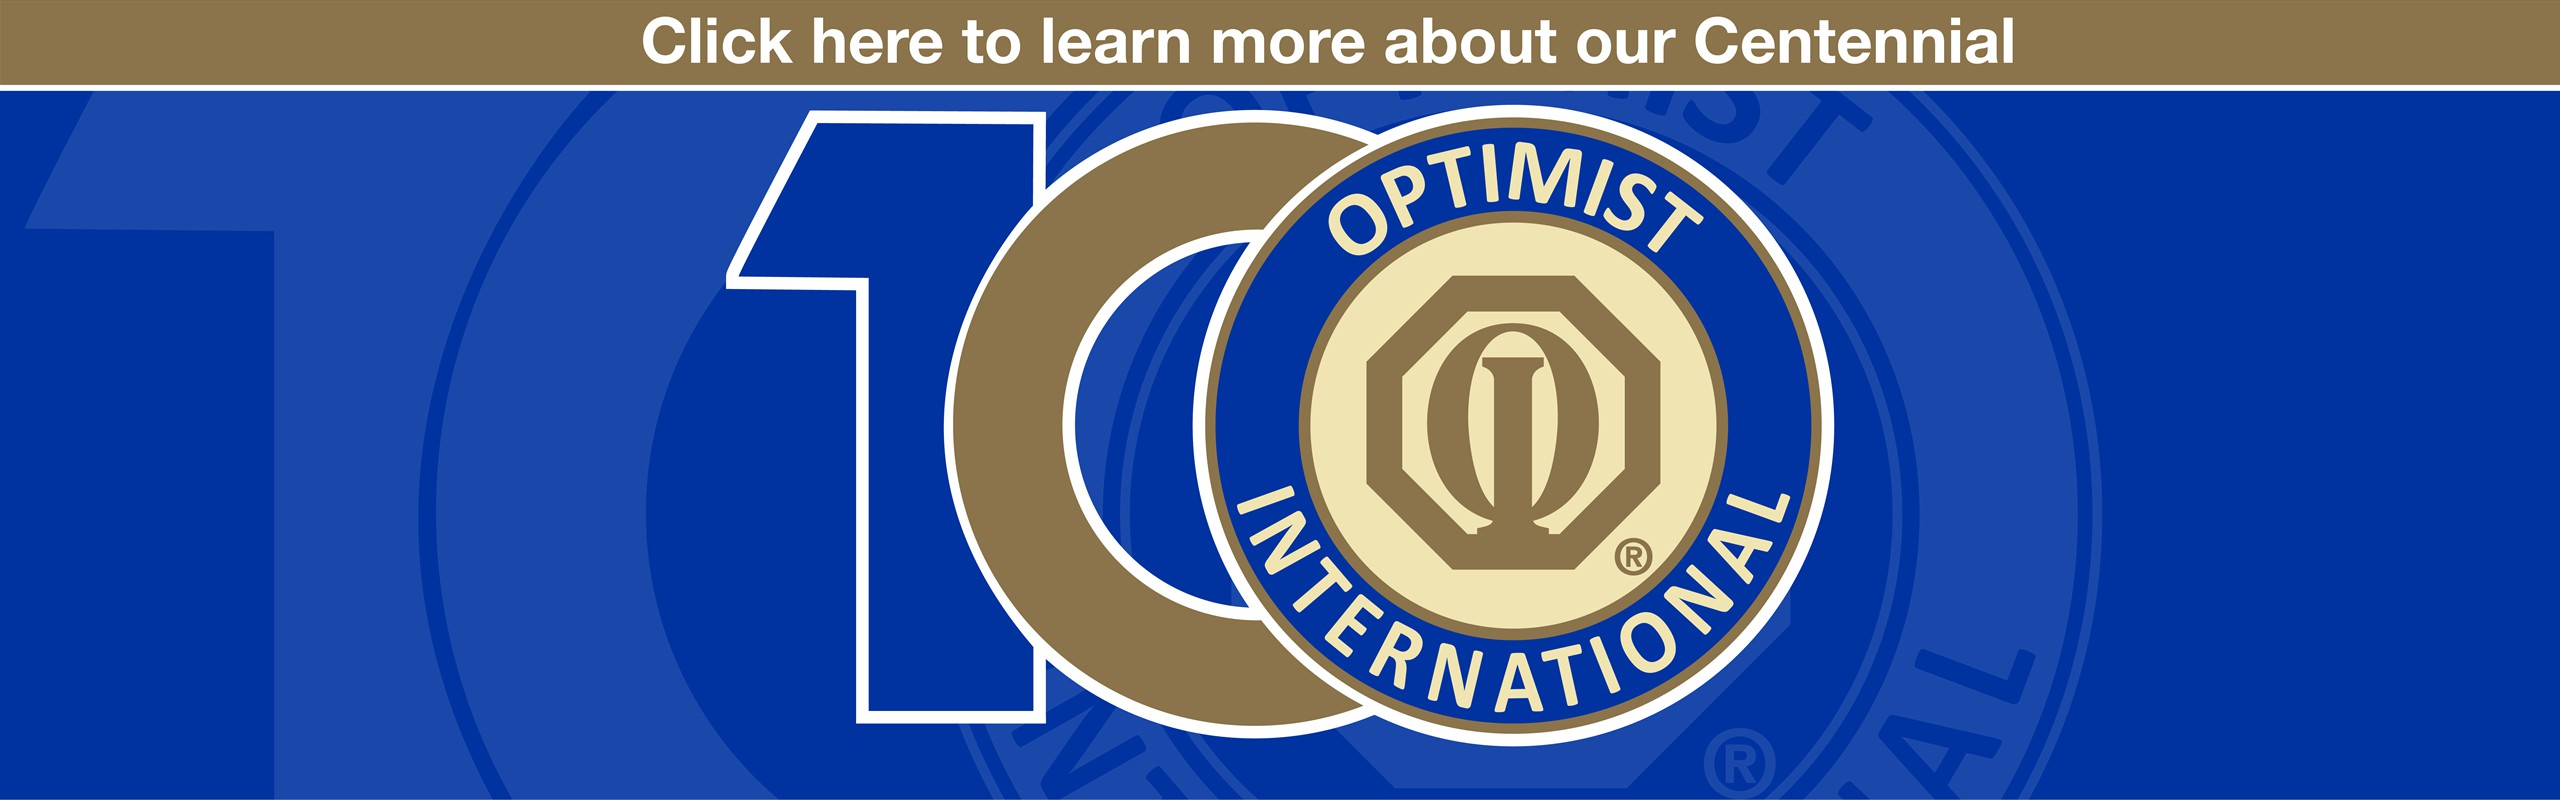 009 Essay Example Centennial Optimist International Wondrous Contest Oratorical Winners Rules Full